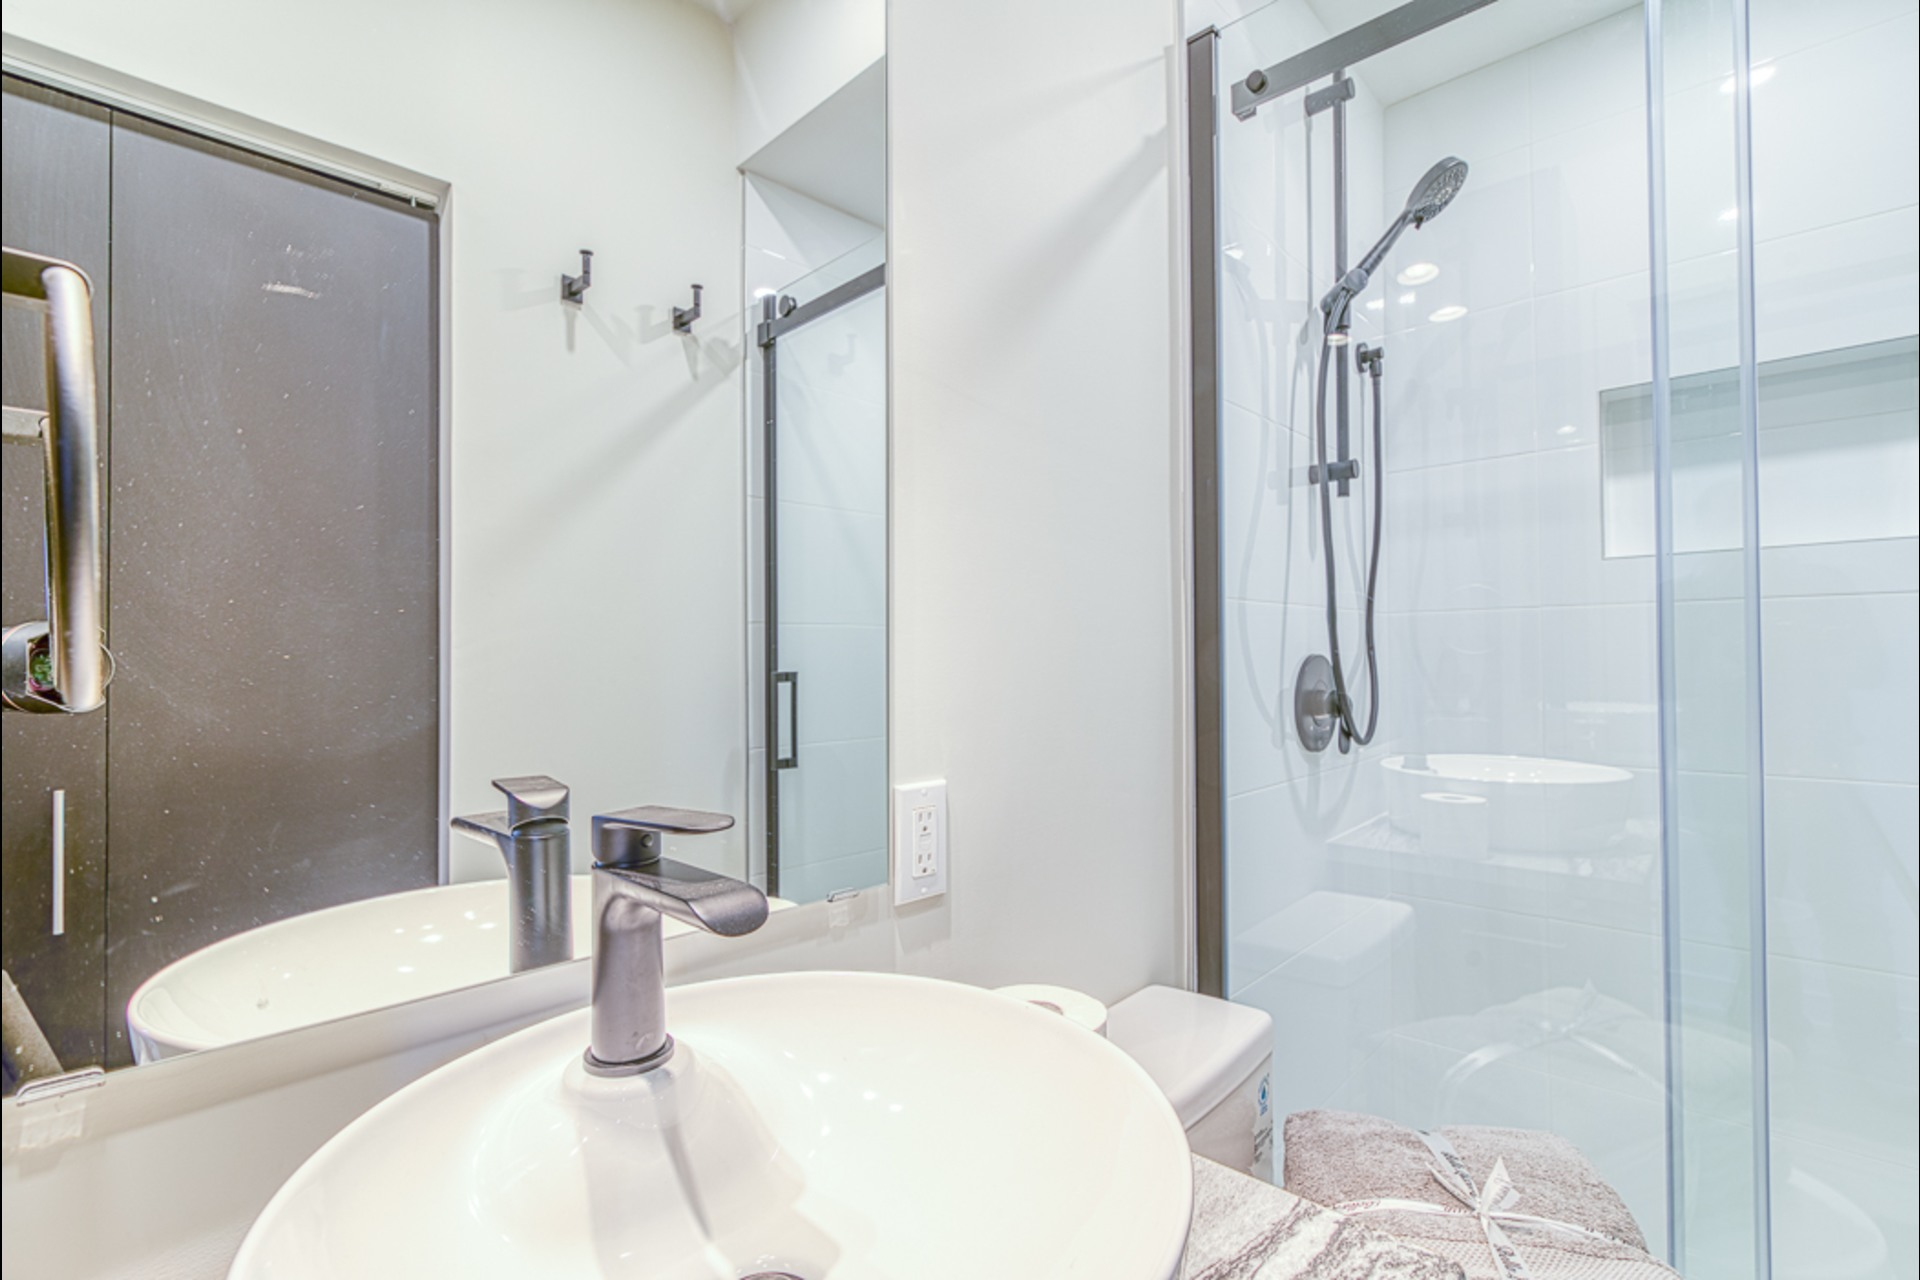 image 9 - Furnished Appartement For rent Montréal - 3 rooms